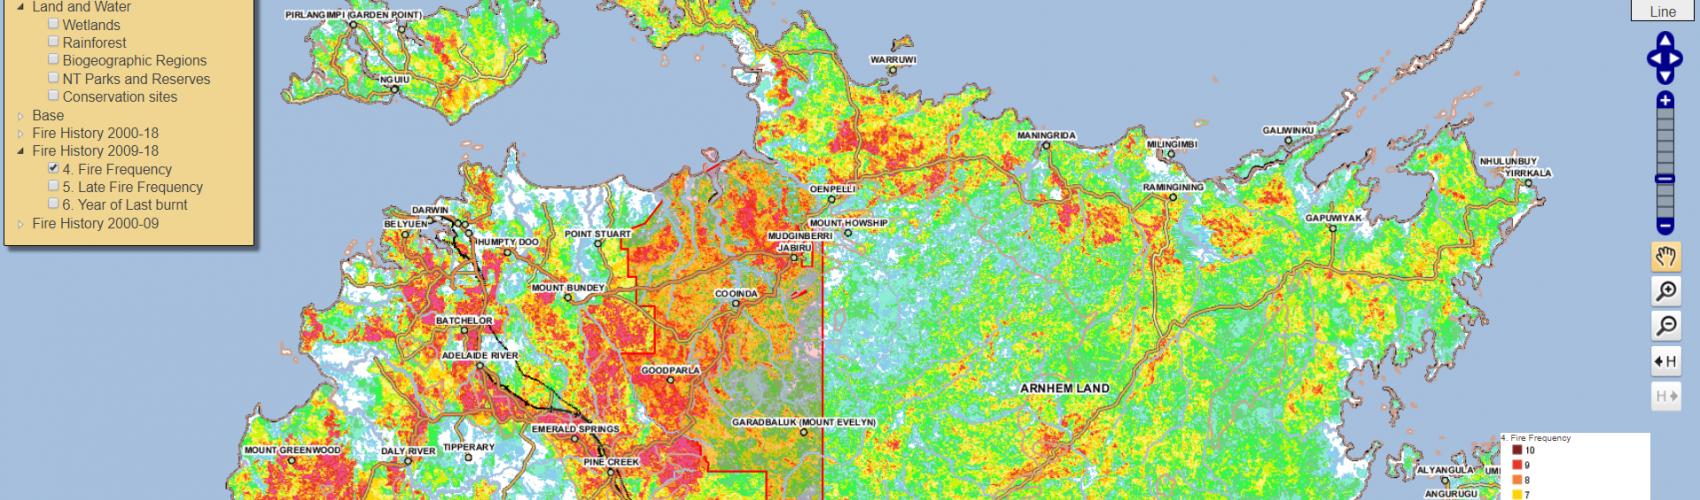 SMERF provides web-based fire maps across Australia's northern savannas and rangelands.